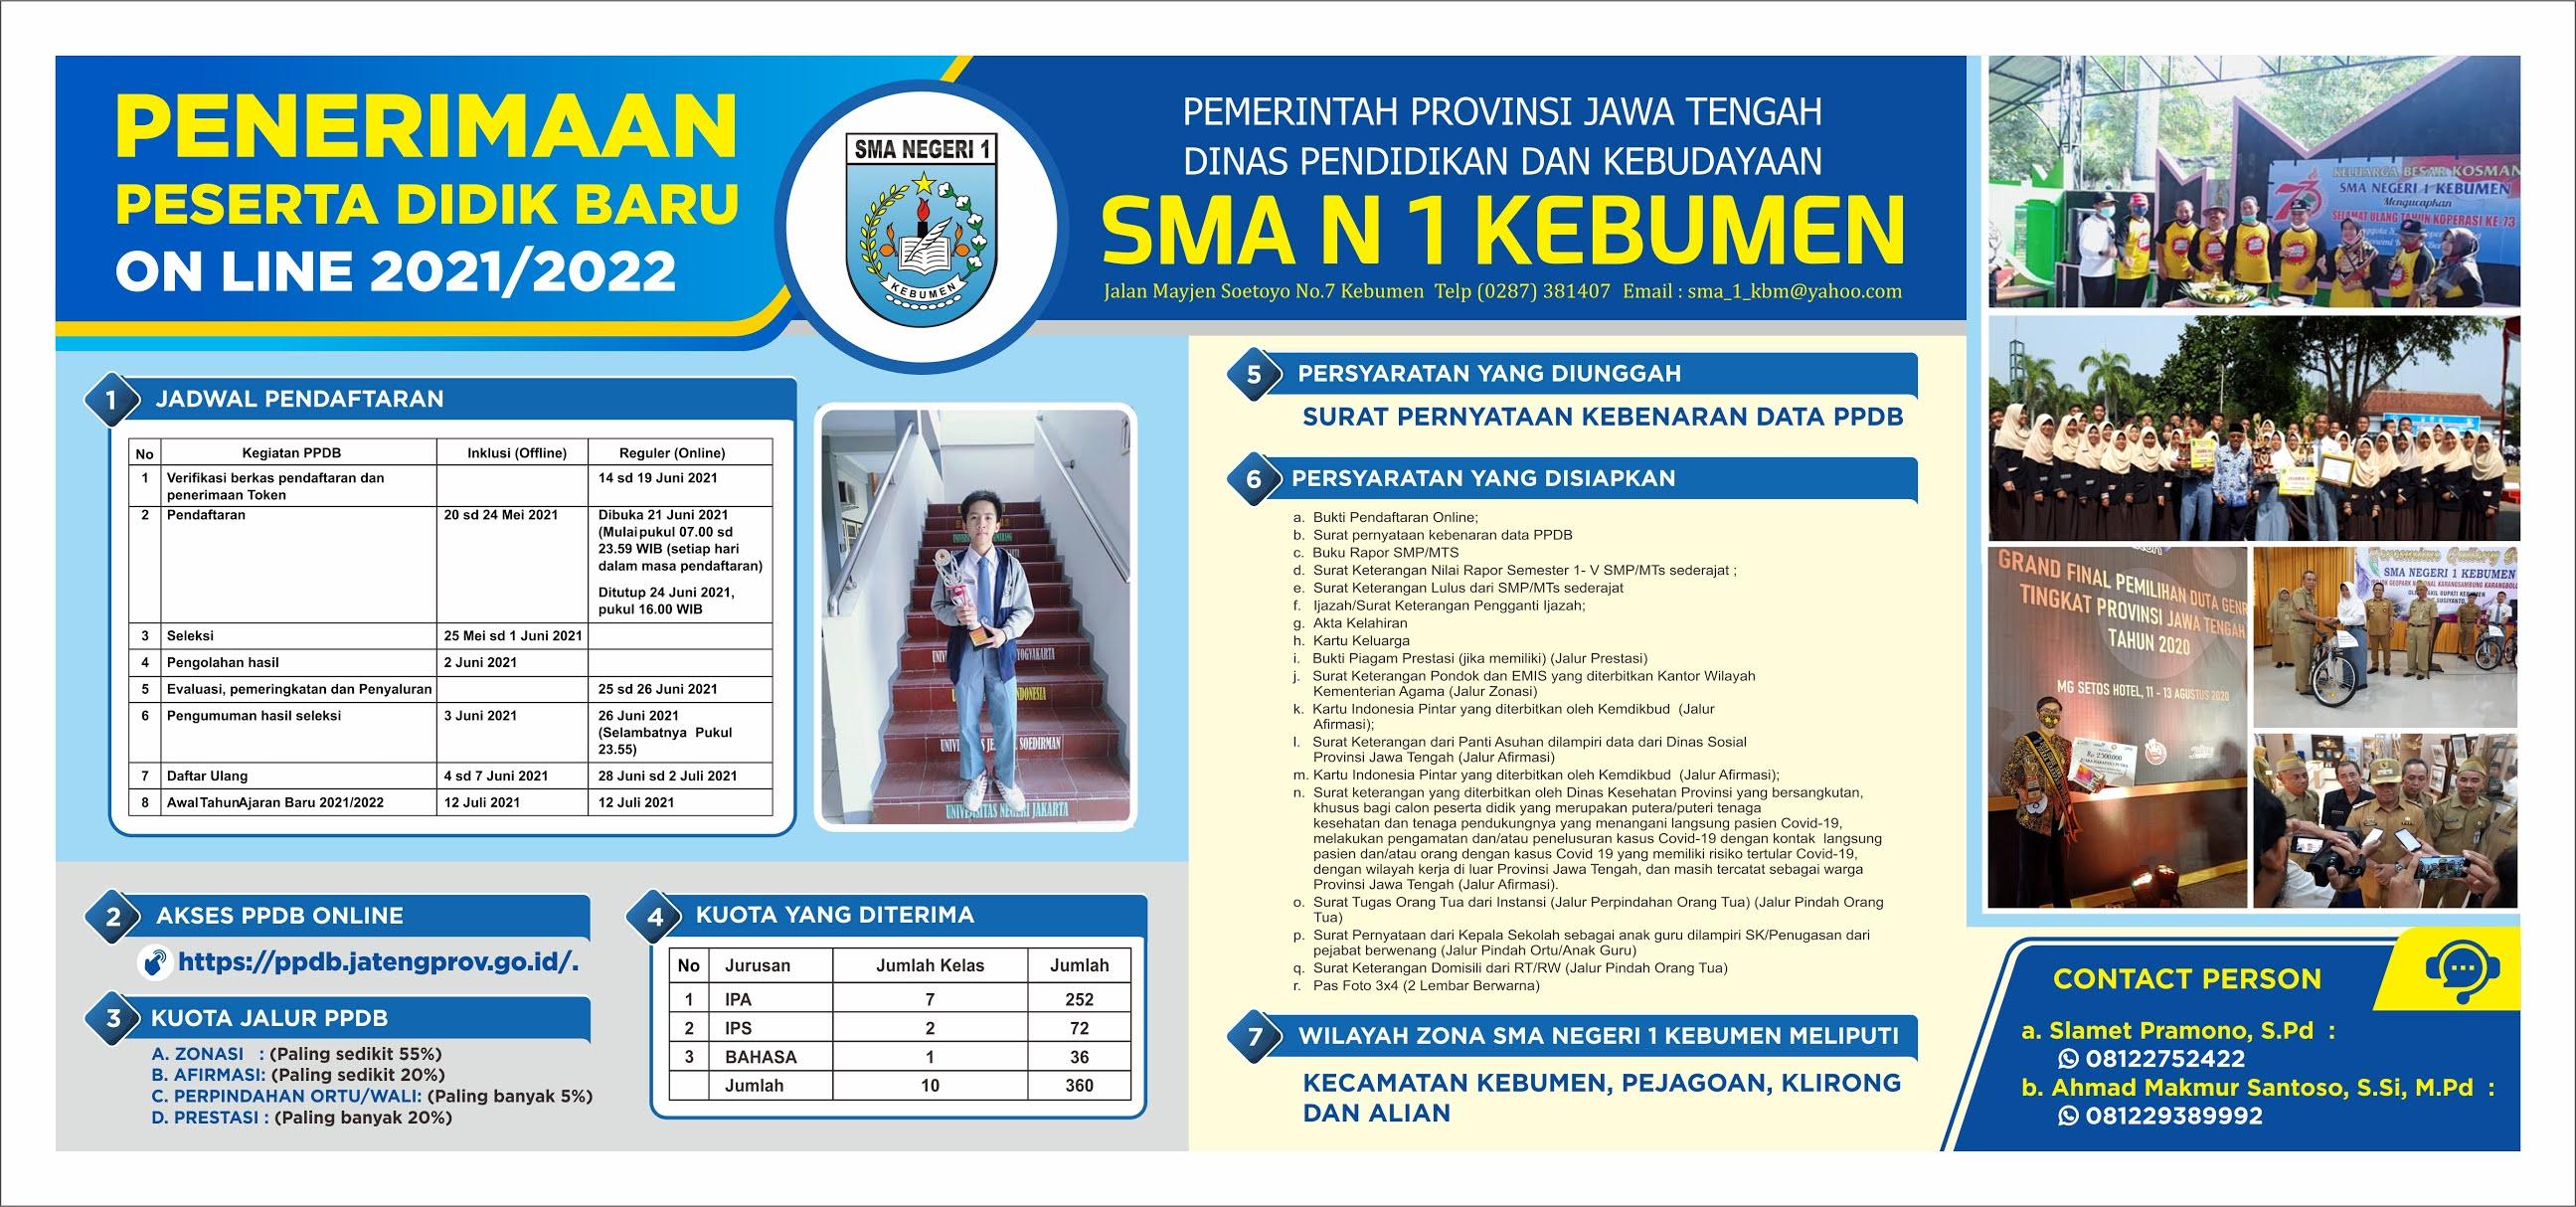 Penerimaan Peserta Didik Baru Tahun Pelajaran 2021/2022